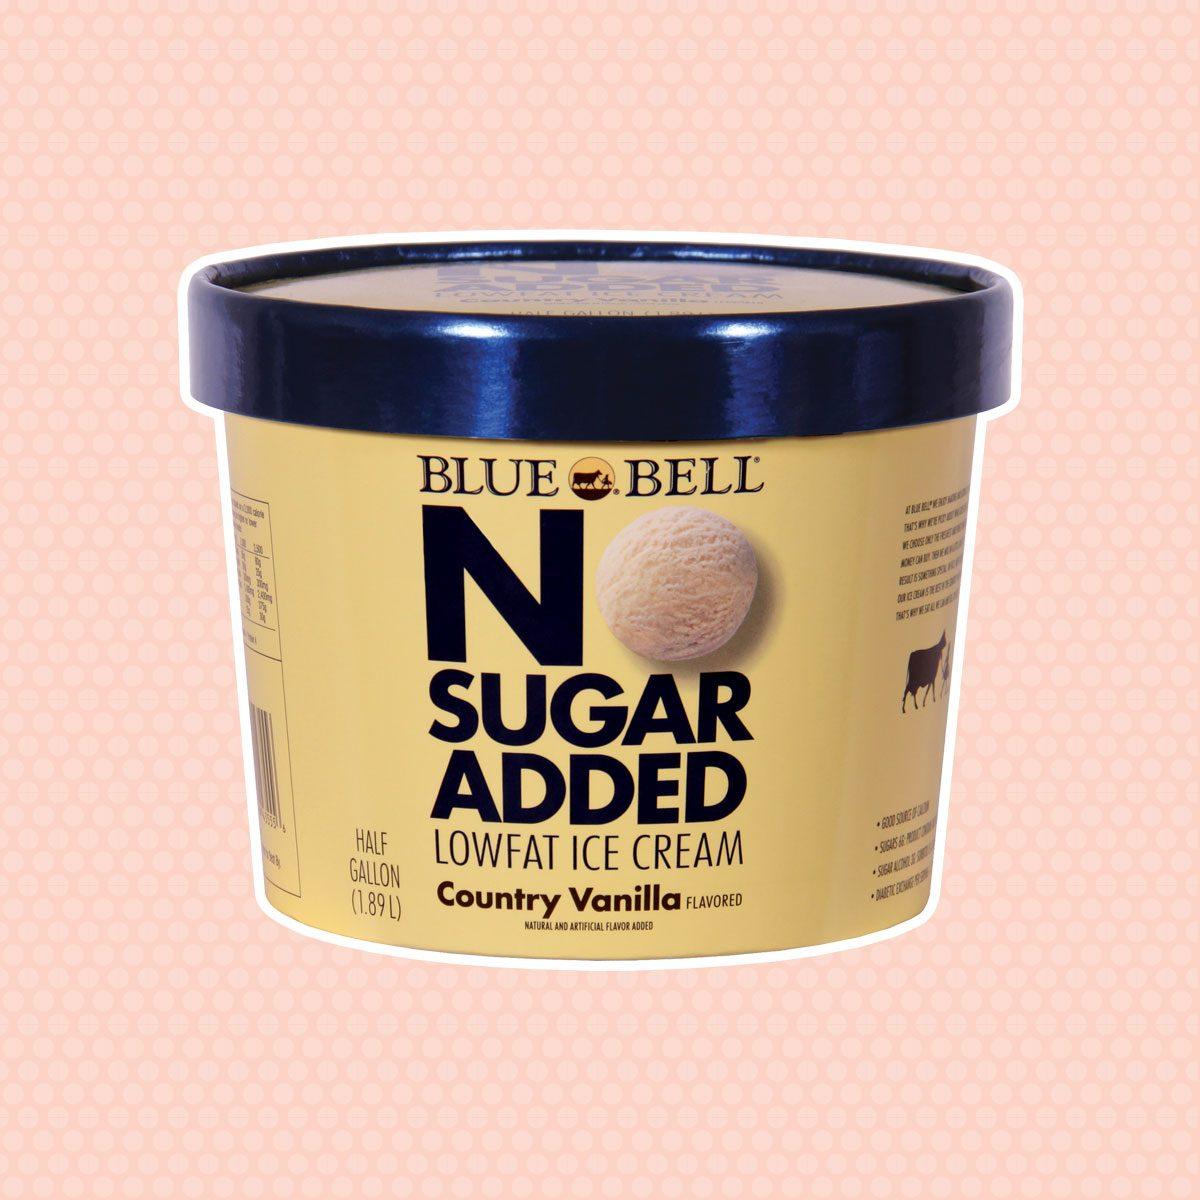 Blue Bell No Sugar Added, Country Vanilla Ice Cream, 64 OZ